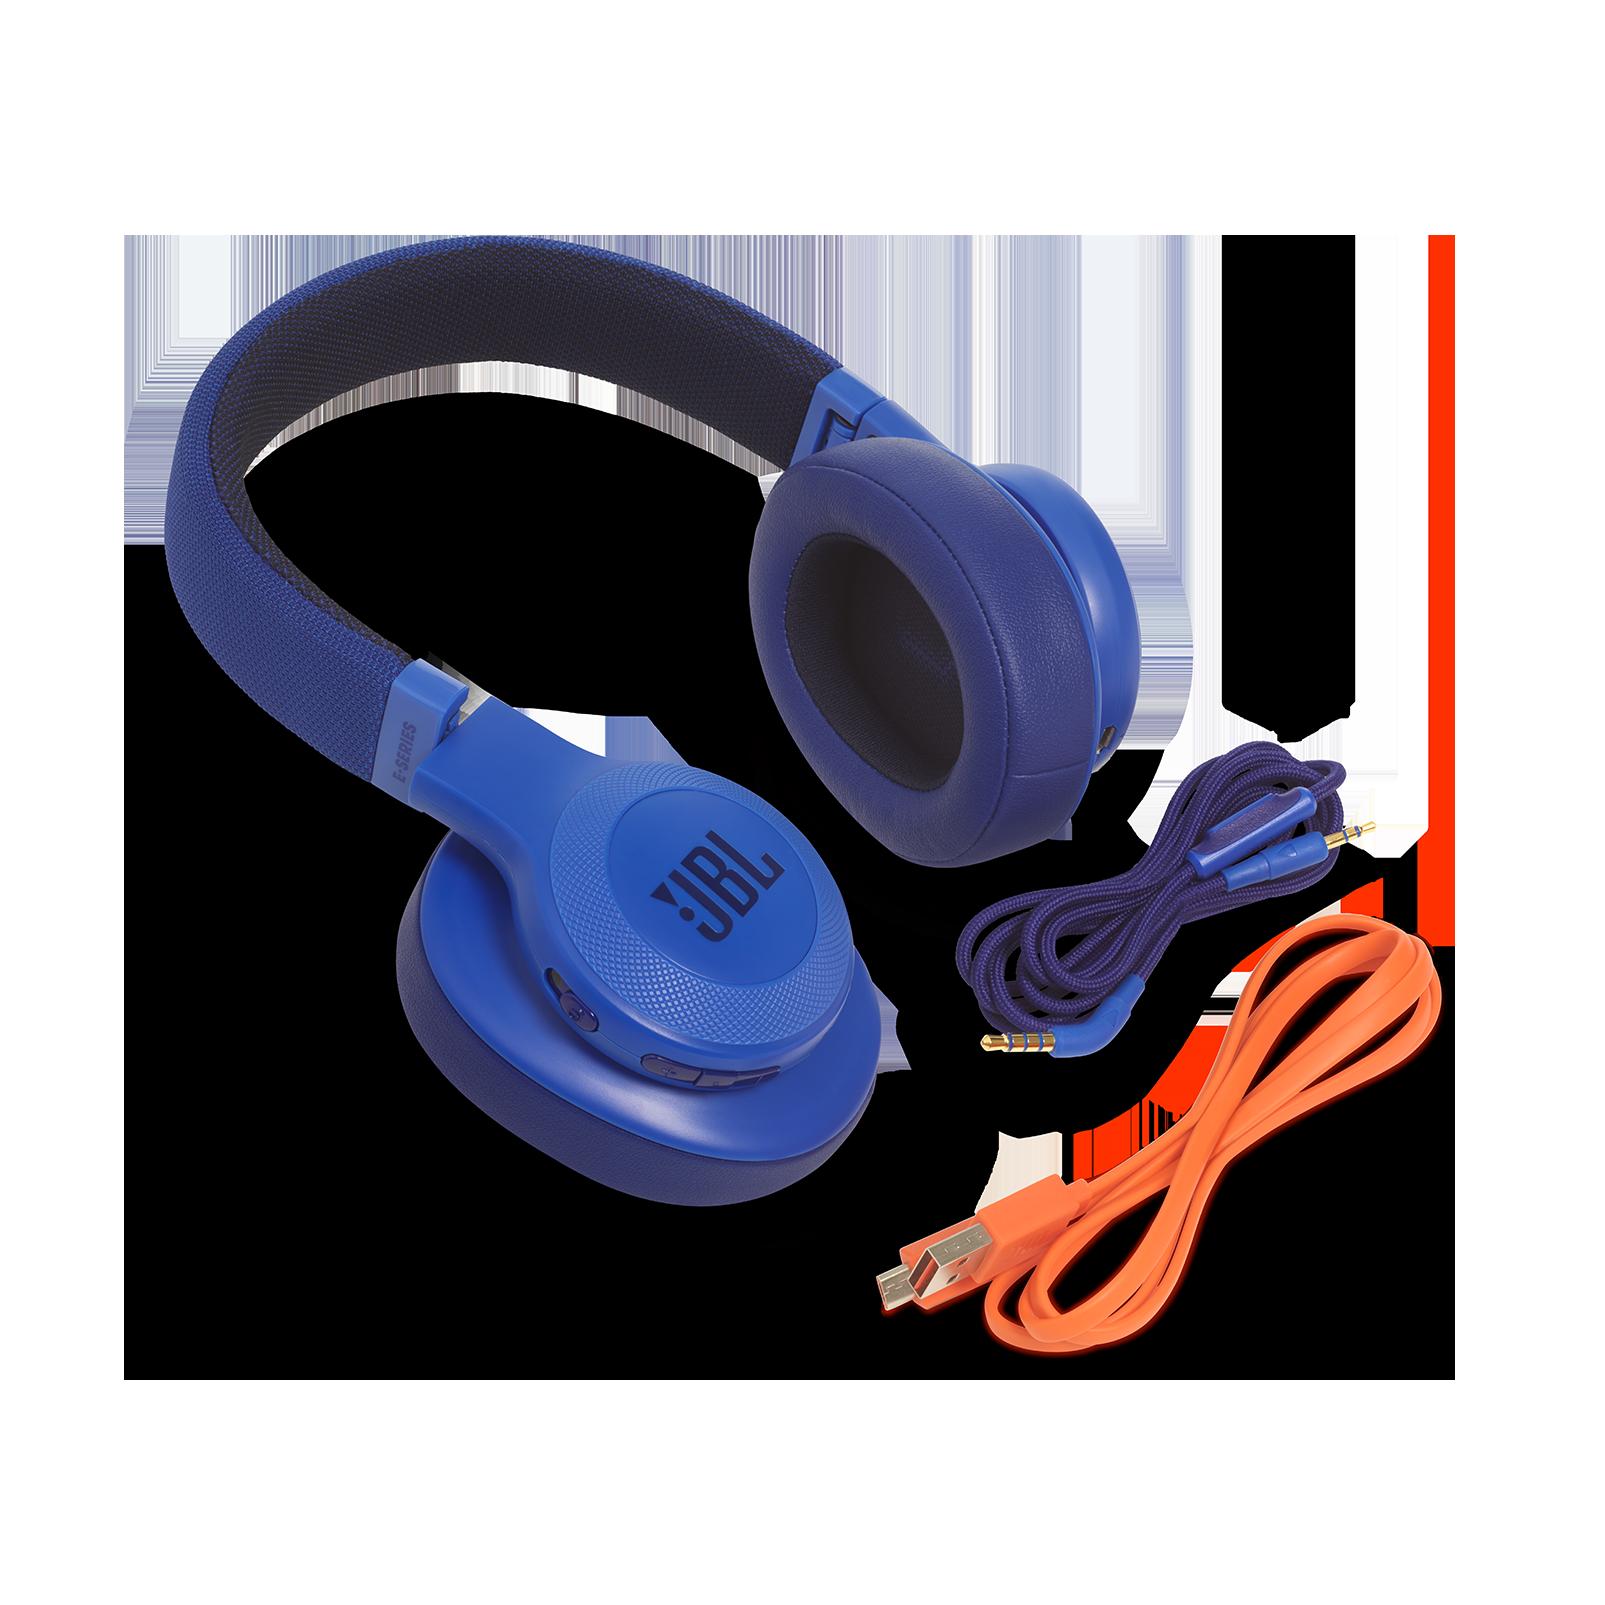 JBL E55BT - Blue - Wireless over-ear headphones - Detailshot 5